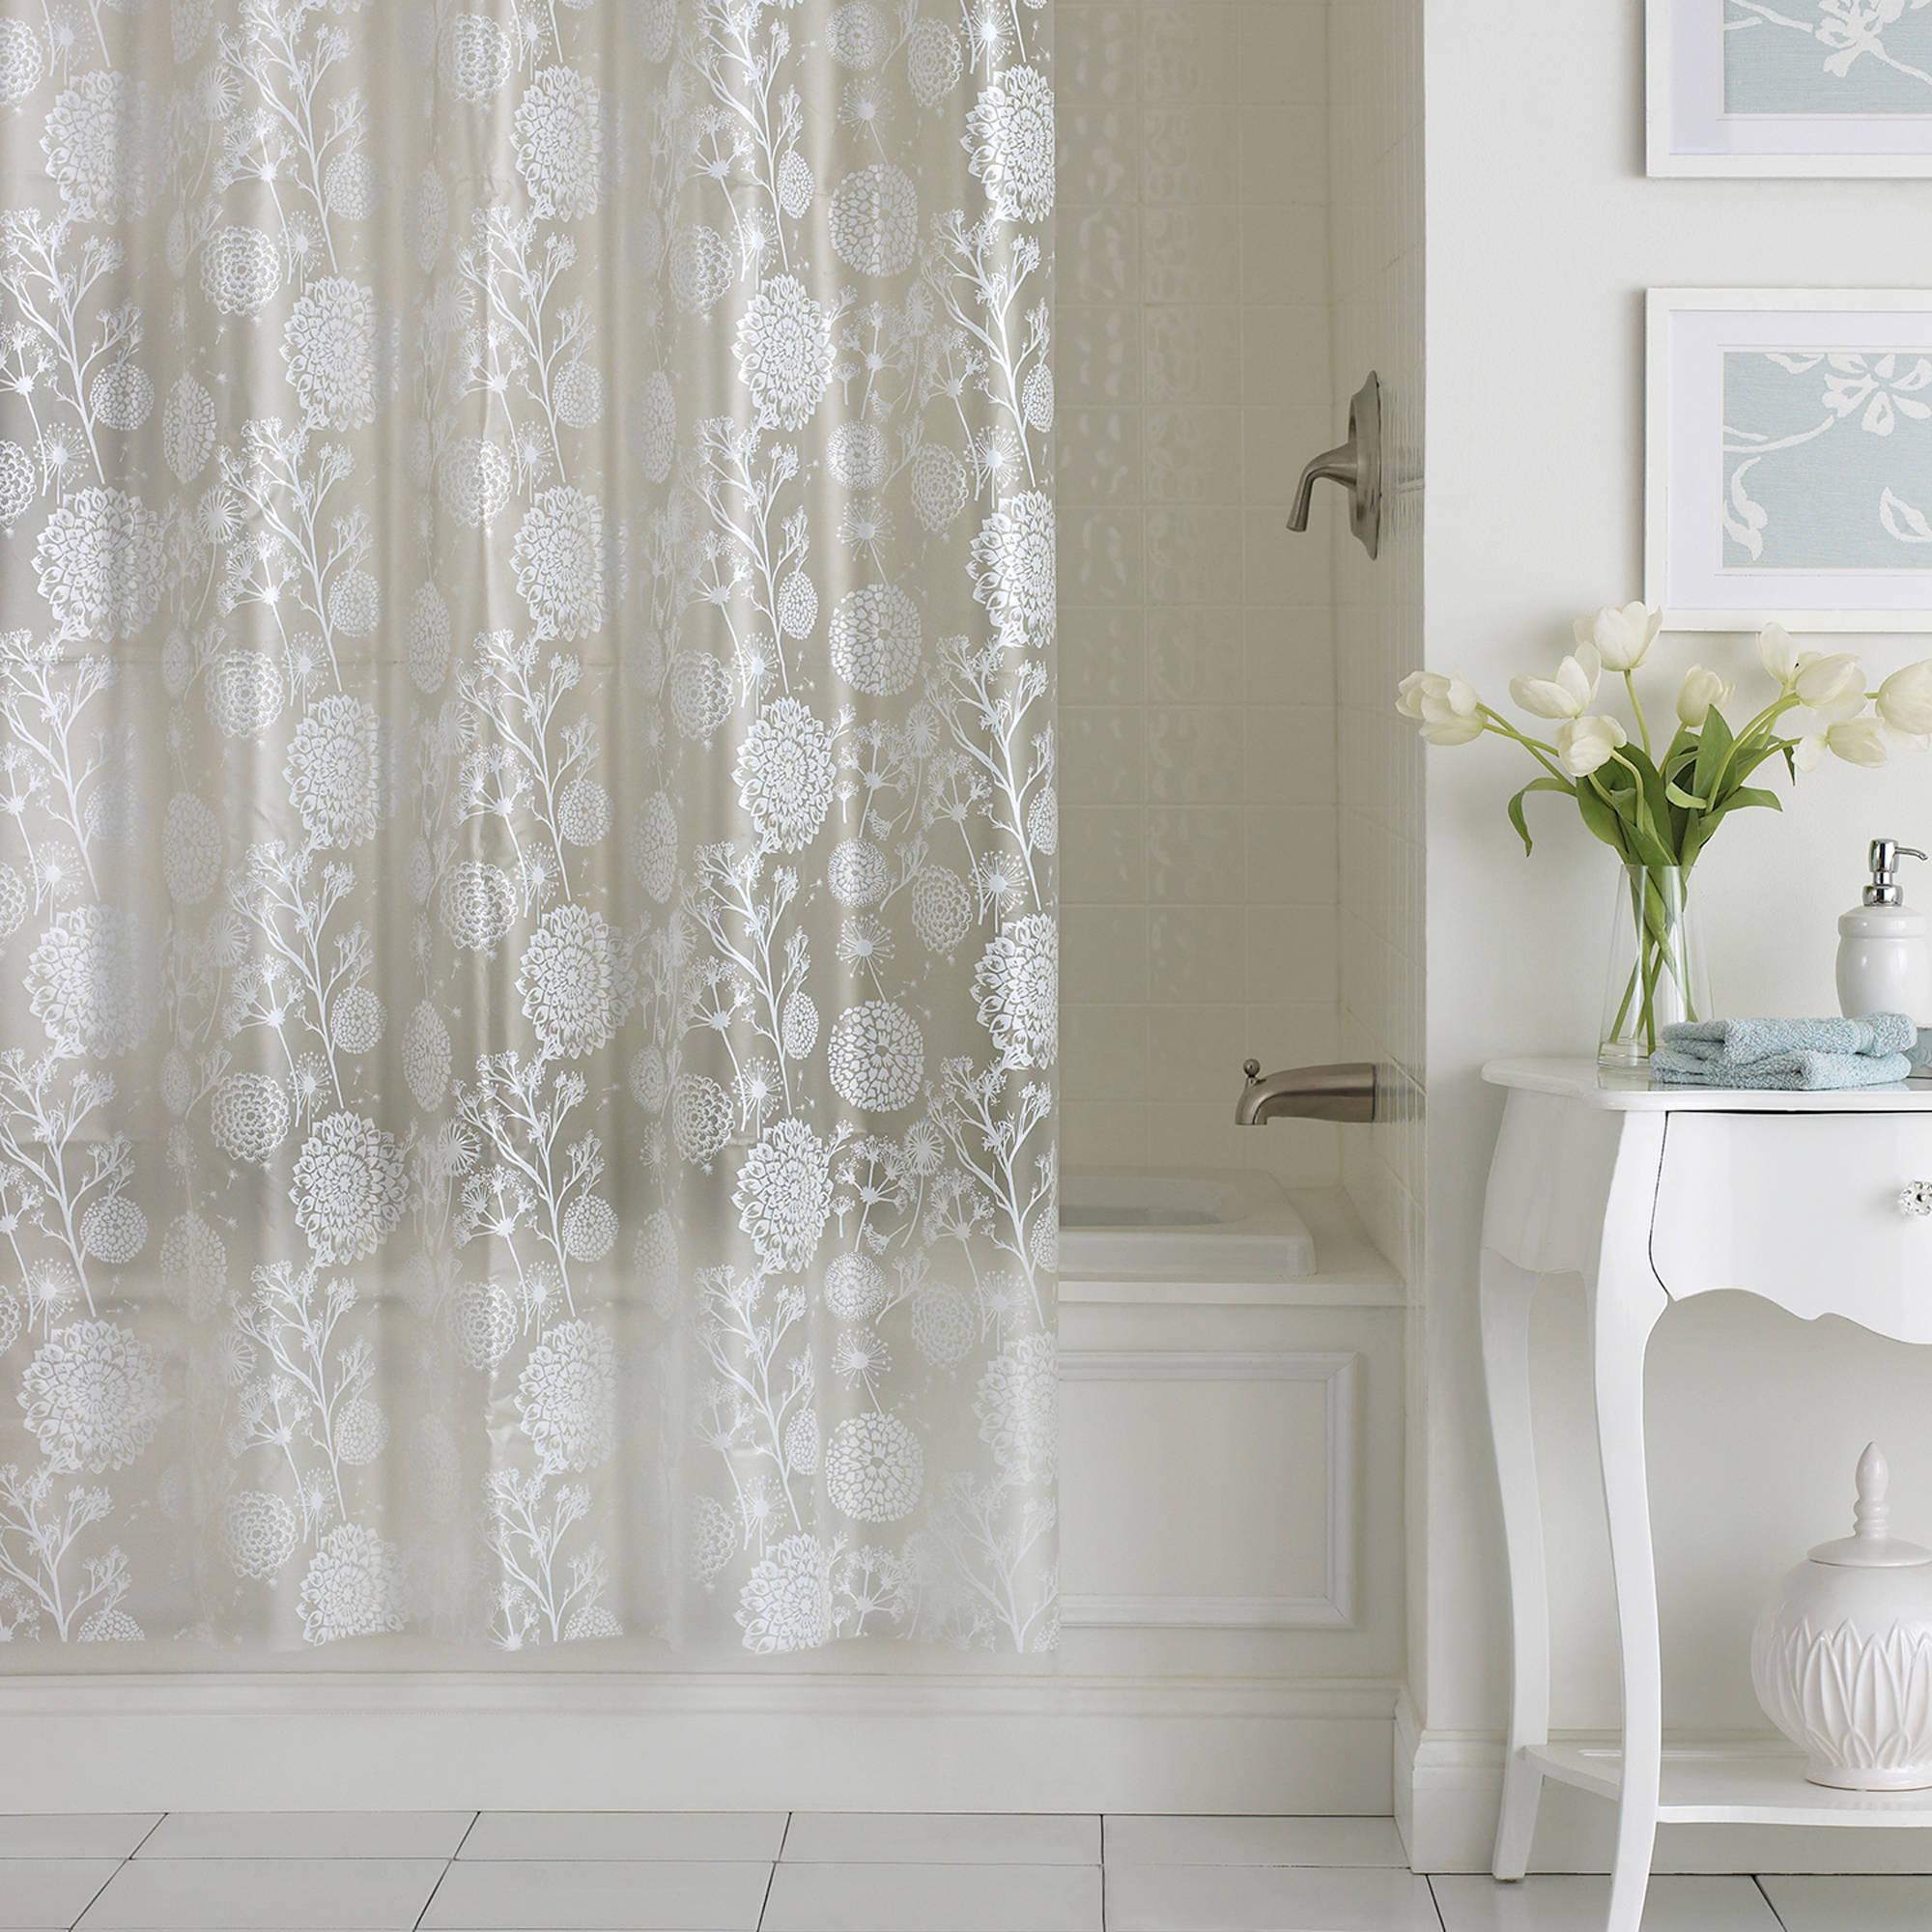 Excell Allegra PEVA Shower Curtain White  Walmartcom